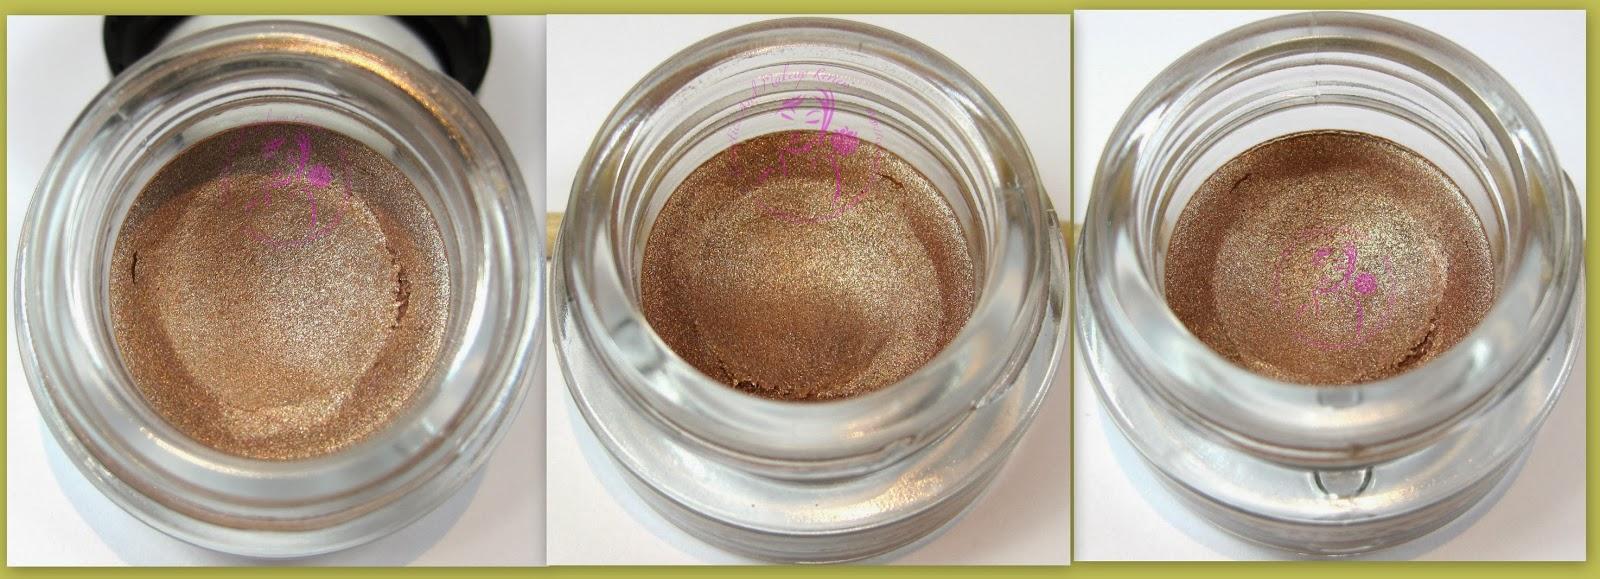 Pupa - Vamp! Cream Eyeshadow n° 100 - Champagne - descrizione